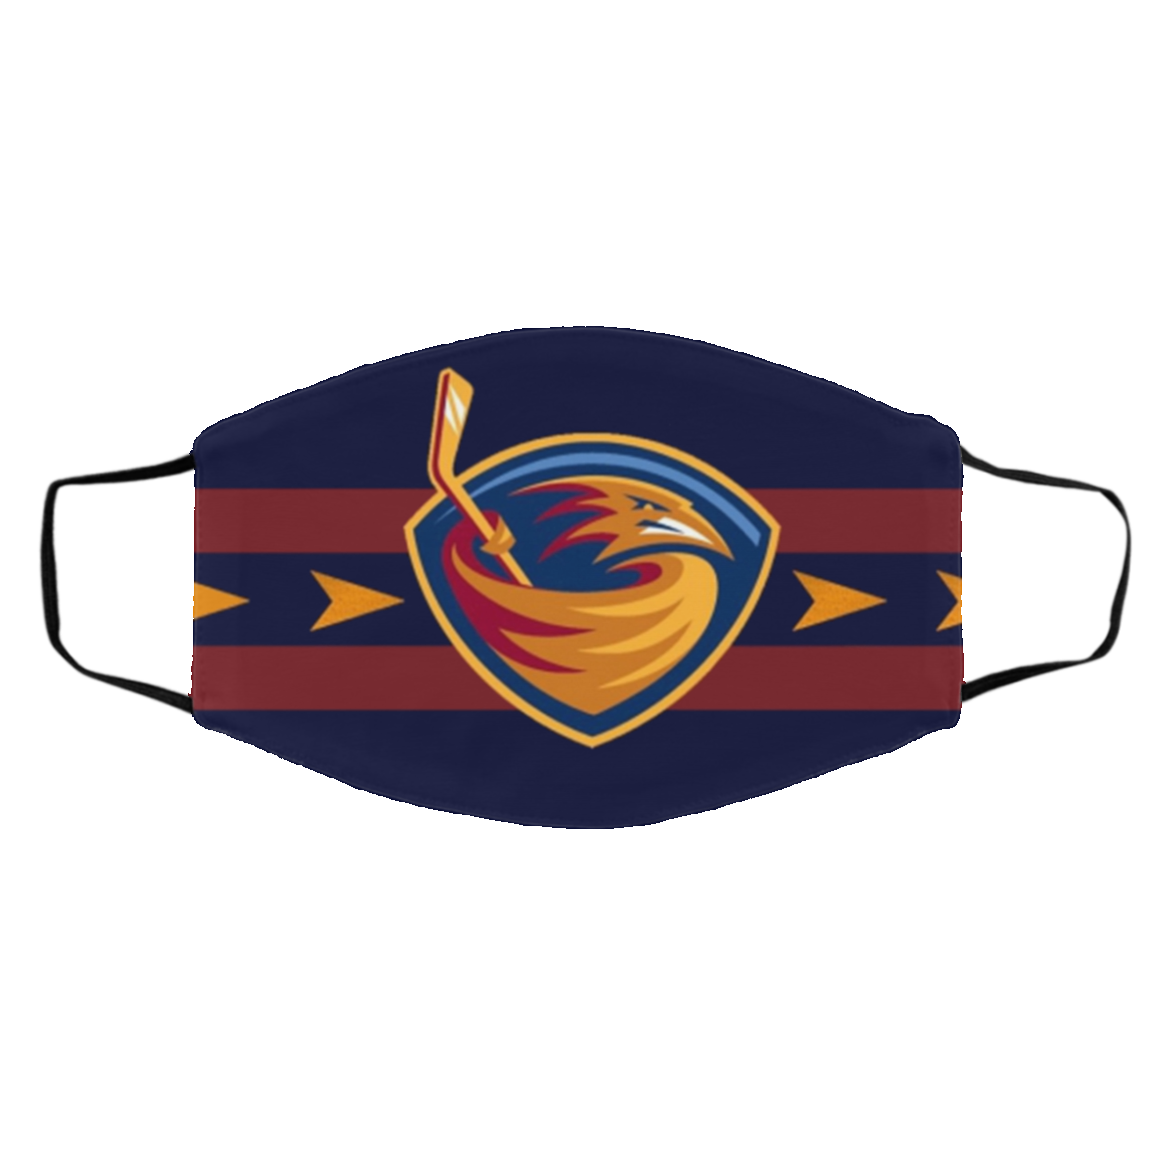 A-tlanta Thras-hers Flag US Cloth Face Mask